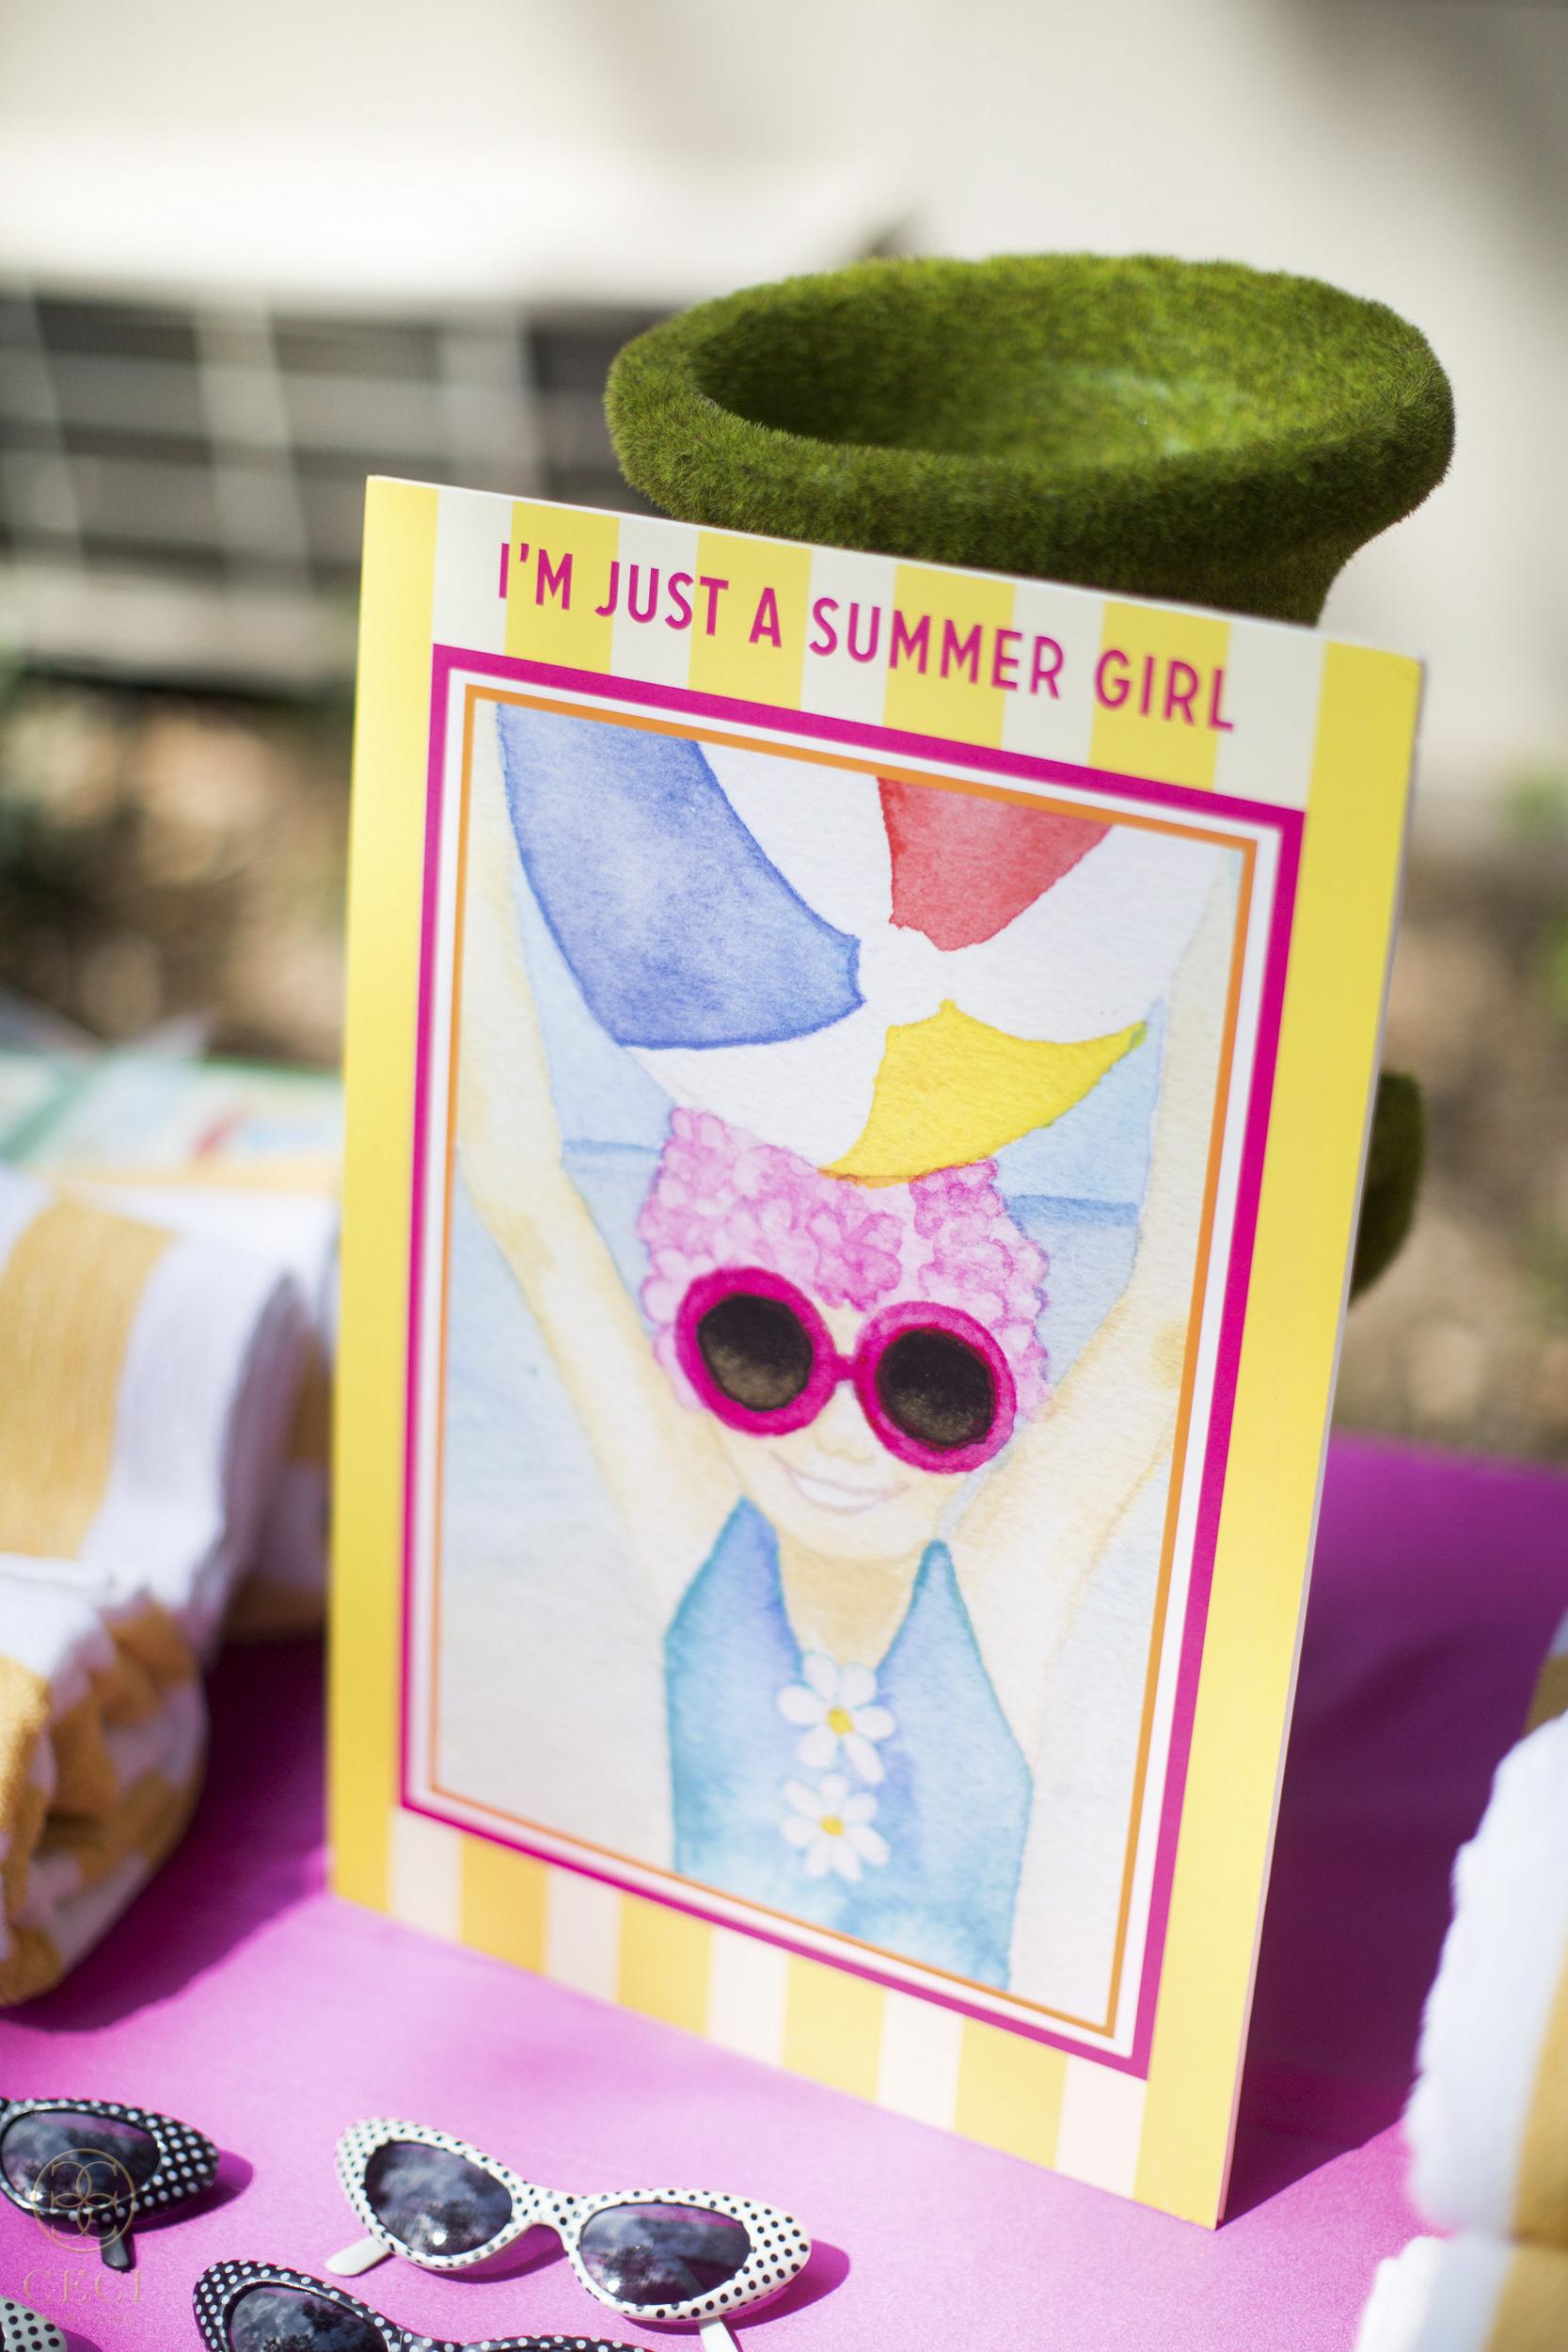 dallas_texas_birthday_party_mae_emily_clarke_events_kids_retro_pool_swim_endless_summer_invitations_ceci_new_york_invitations_watercolor_illustration_decor-7.jpg